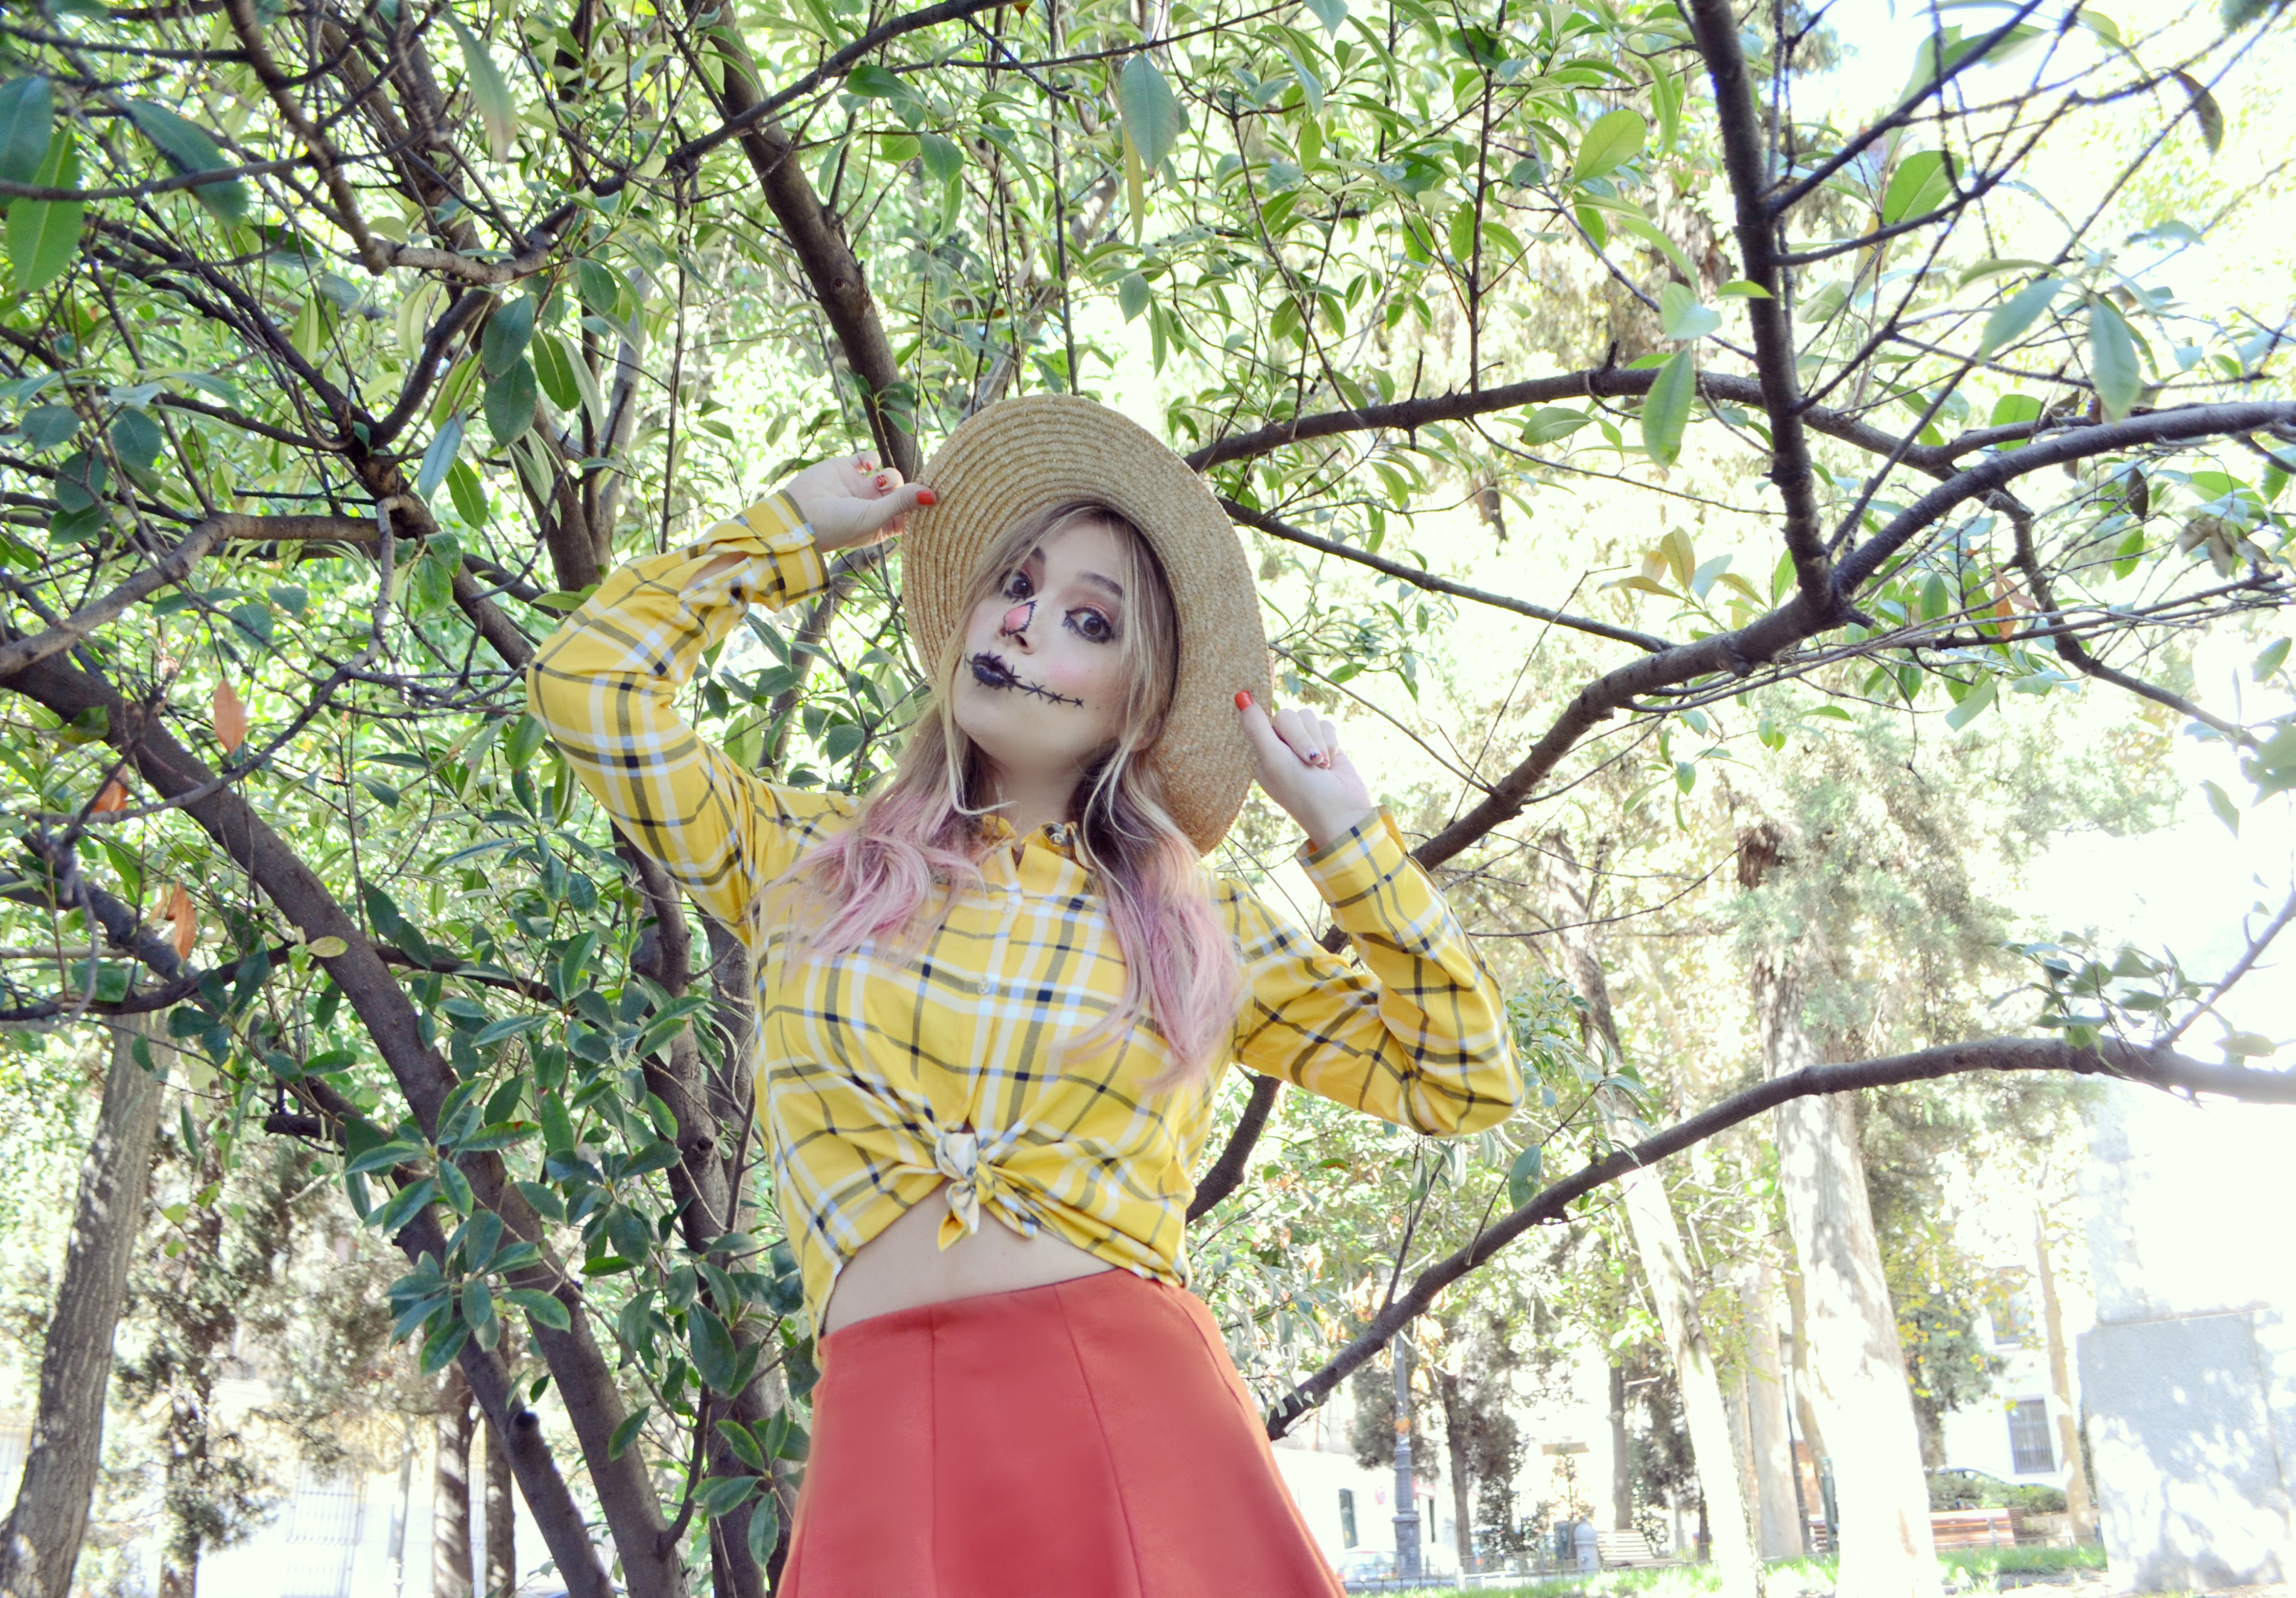 scarecrow-costume-halloween-blog-de-moda-fashionista-ChicAdicta-influencer-Chic-Adicta-maquillaje-a-domicilio-urvan-Madrid-PiensaenChic-Piensa-en-Chic